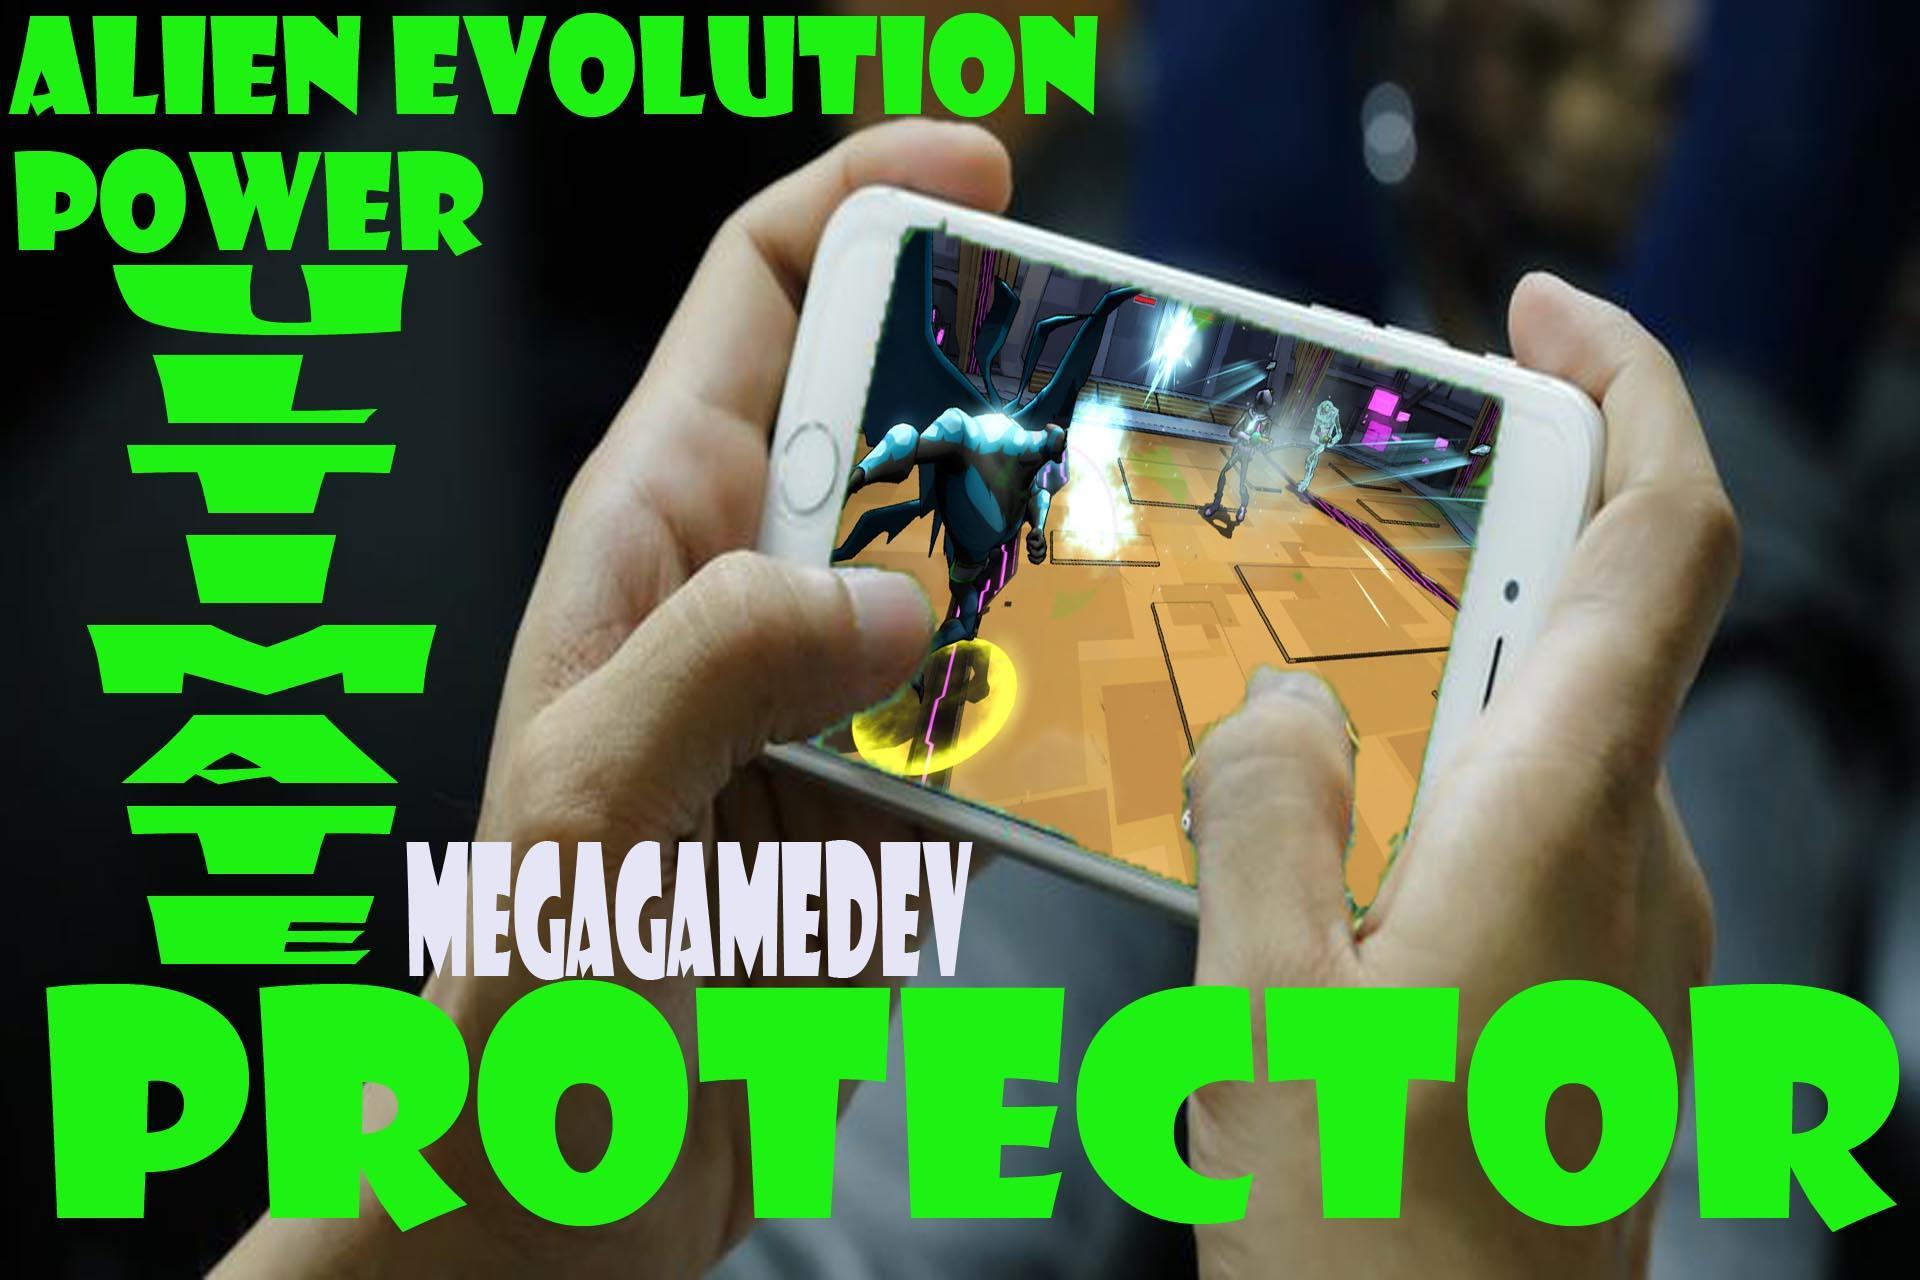 Alien Evolution : Power Ultimate 10 Protector 4.c Screenshot 2